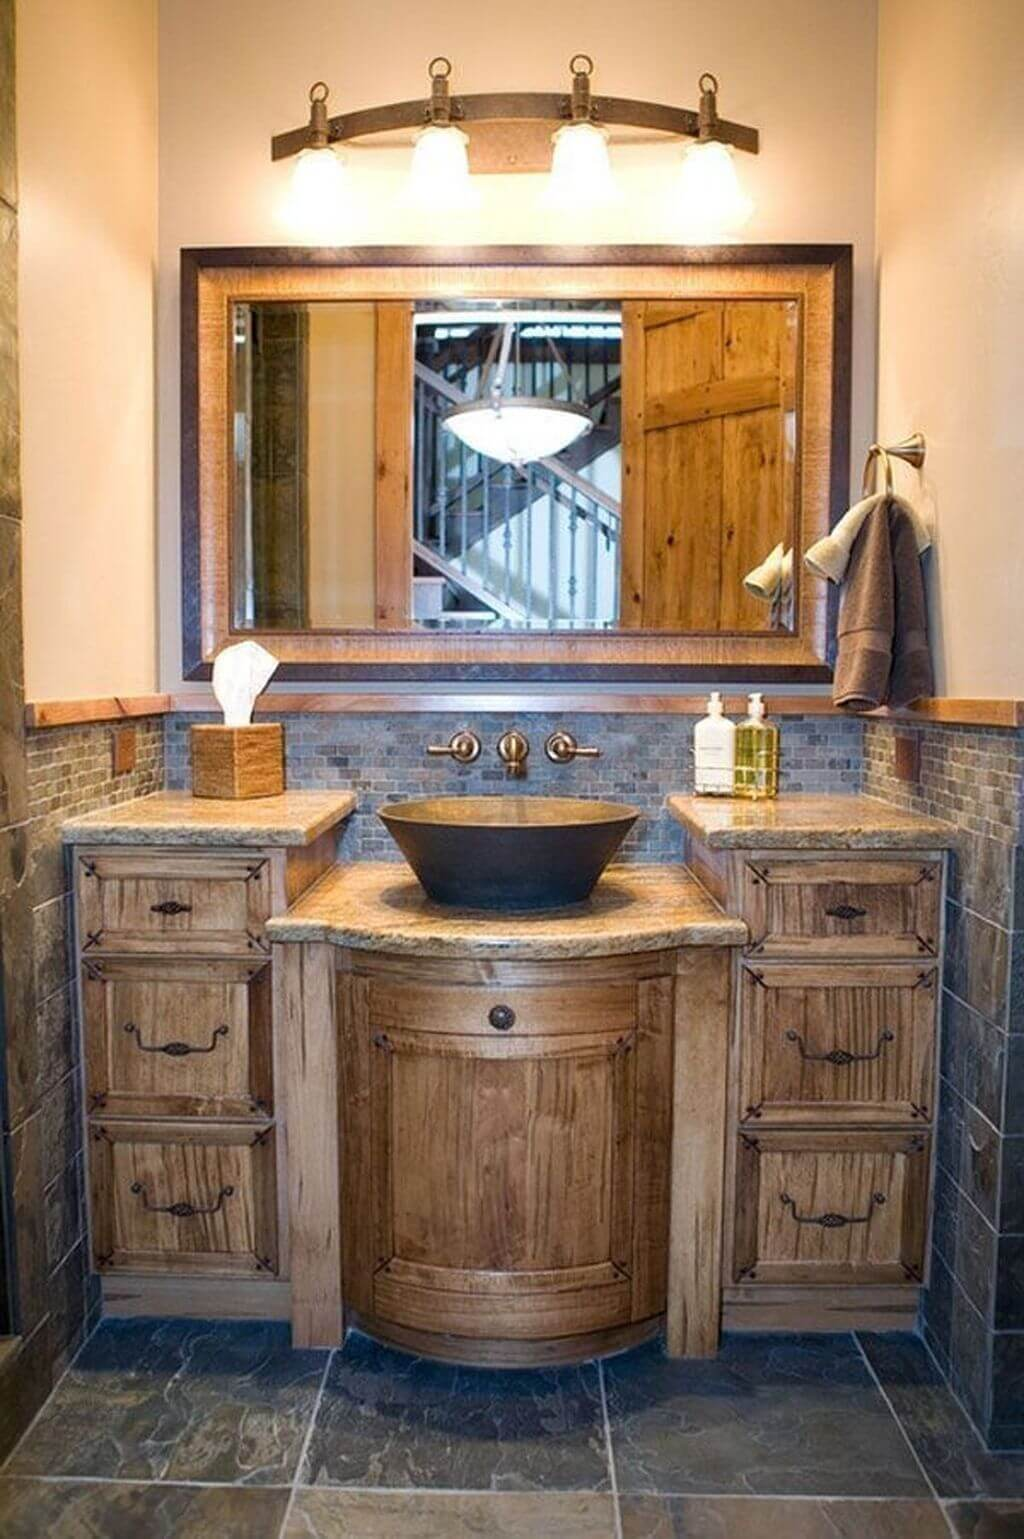 25 Cozy Rustic Bathroom Decor To Guide Your Renovation - W25